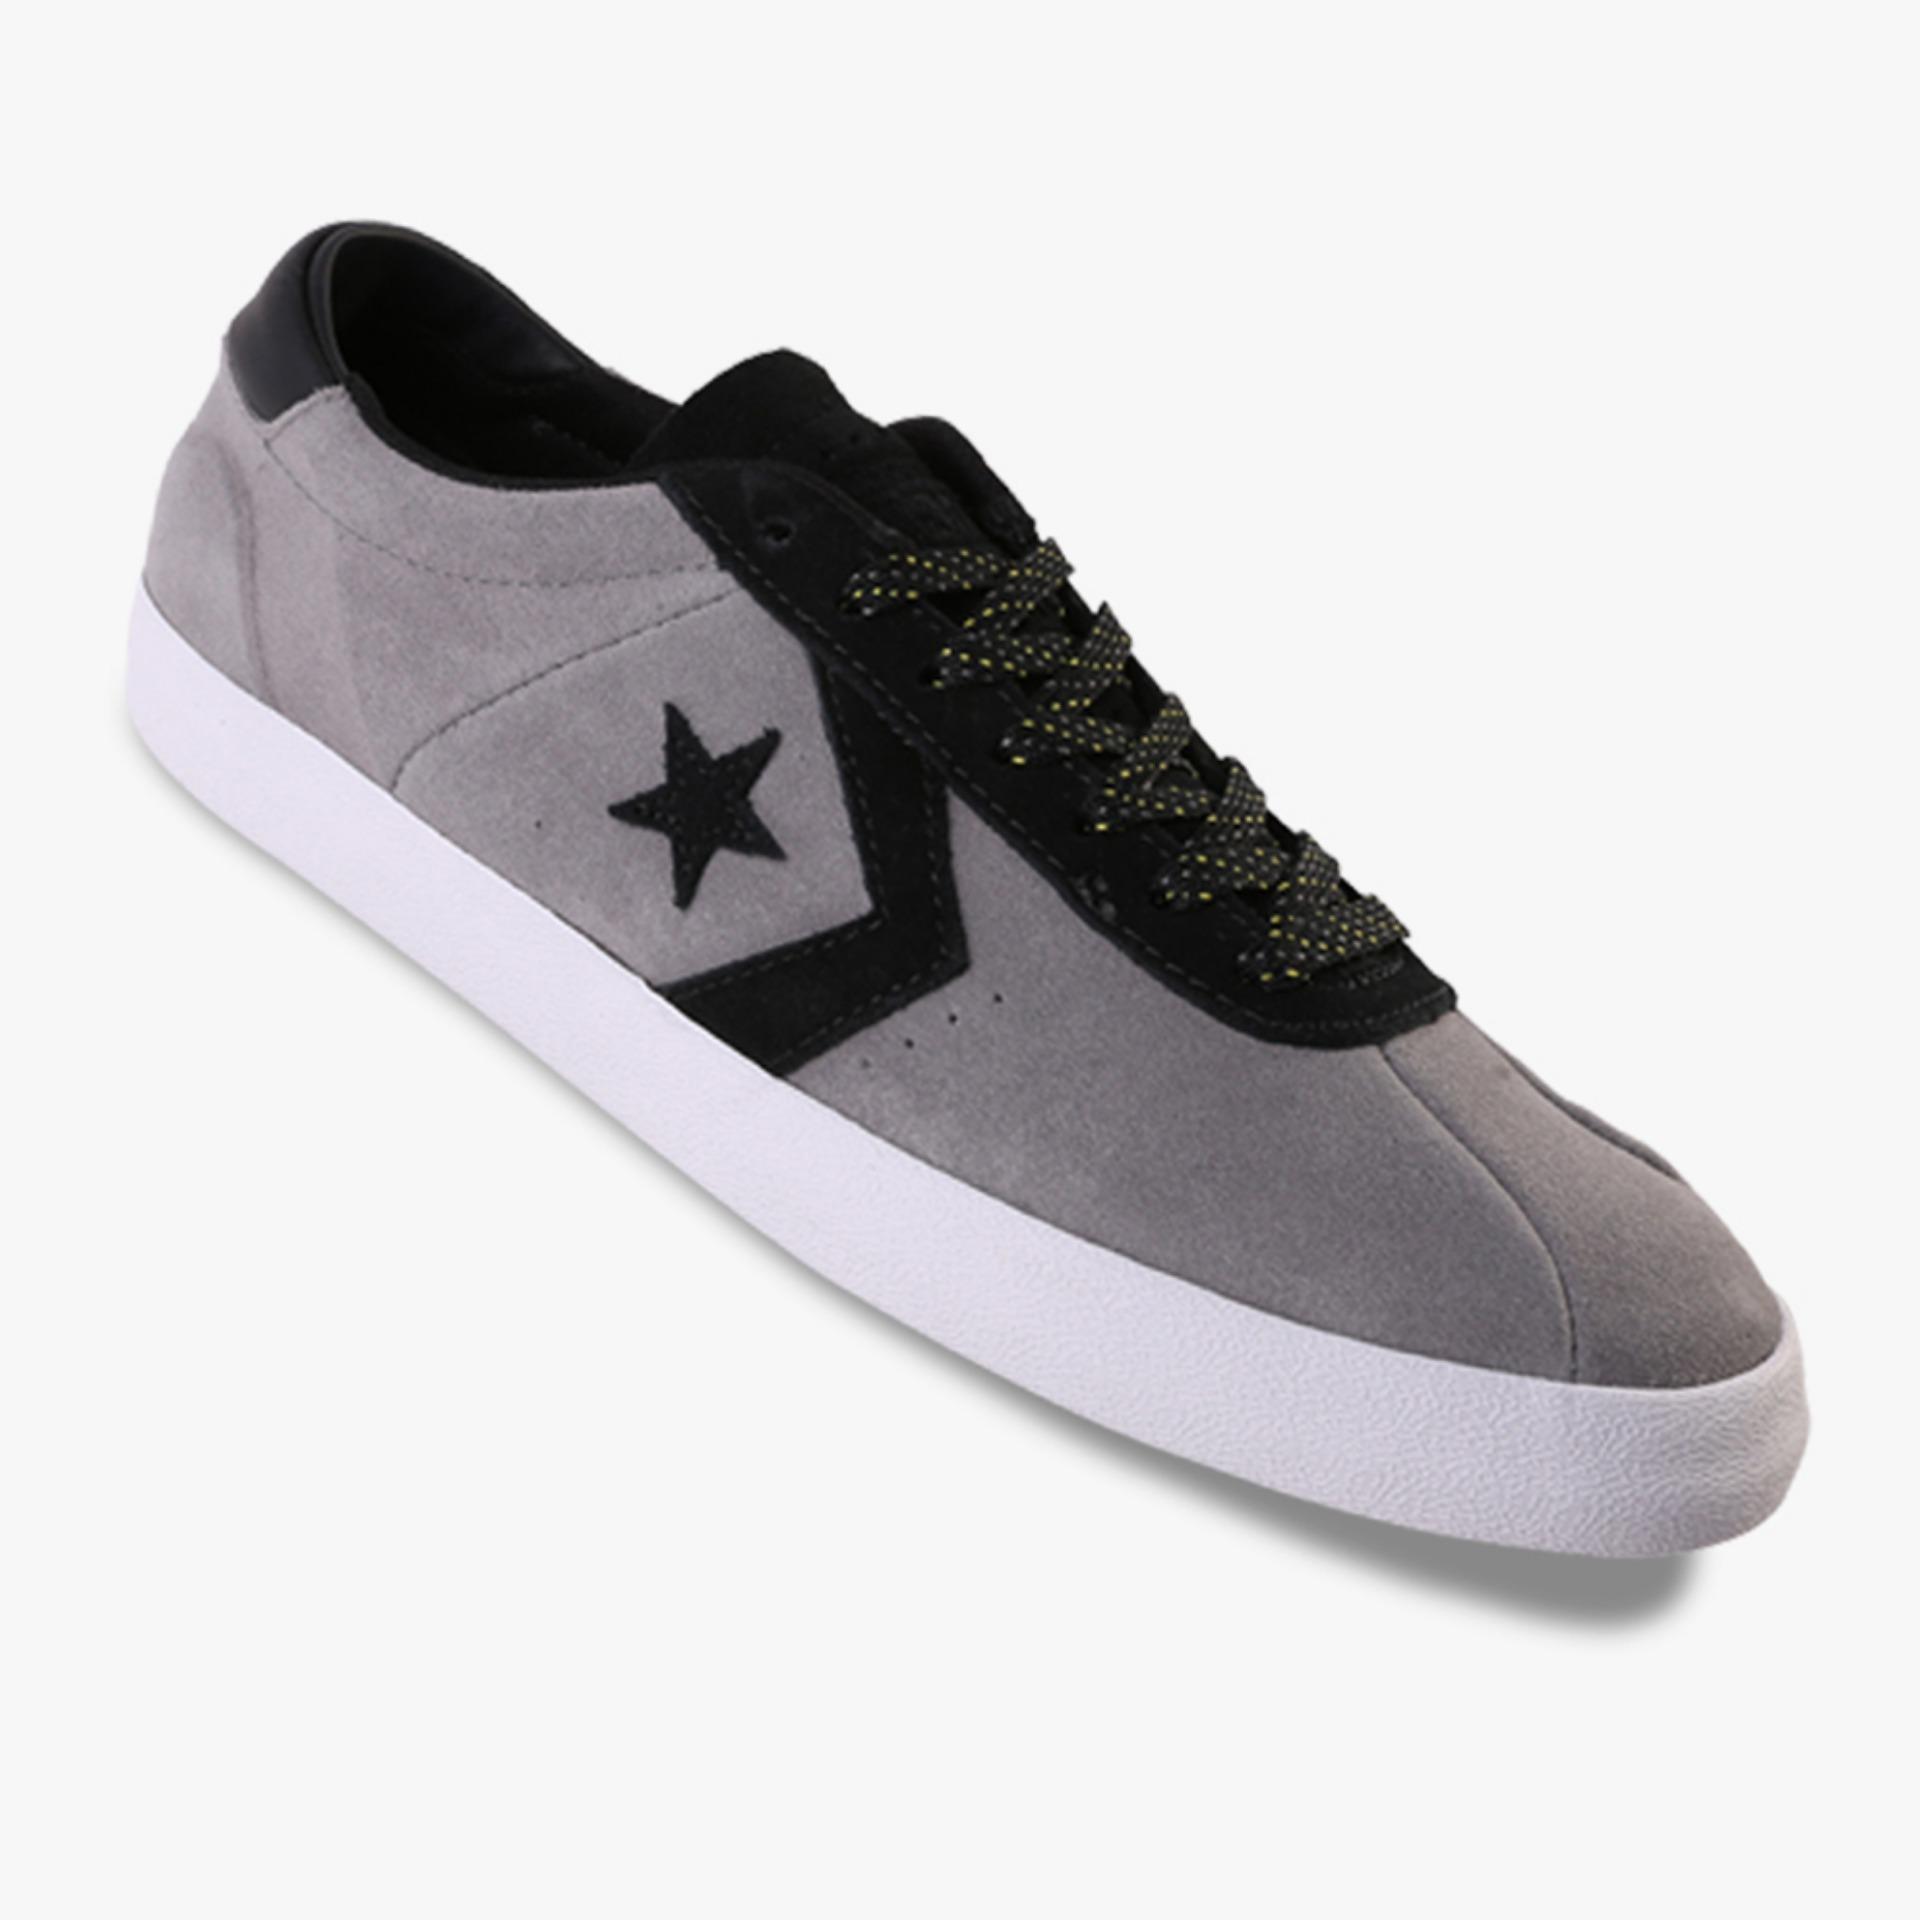 Spesifikasi Converse Breakpoint Pro Ox Men S Sneakers Unisex Size Abu Abu Beserta Harganya